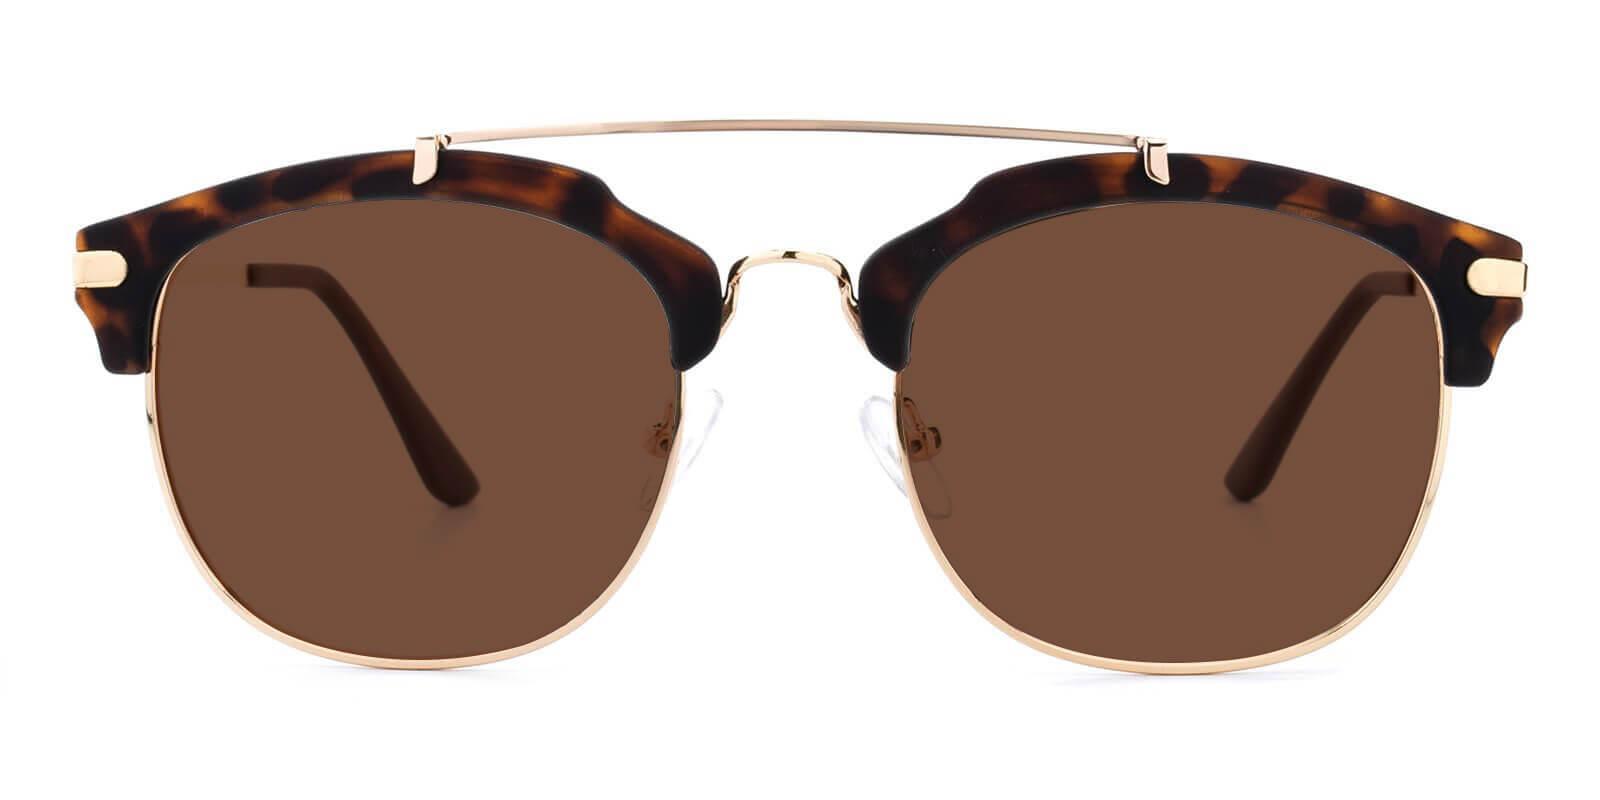 Icychem-Tortoise-Browline-Acetate-Sunglasses-additional2